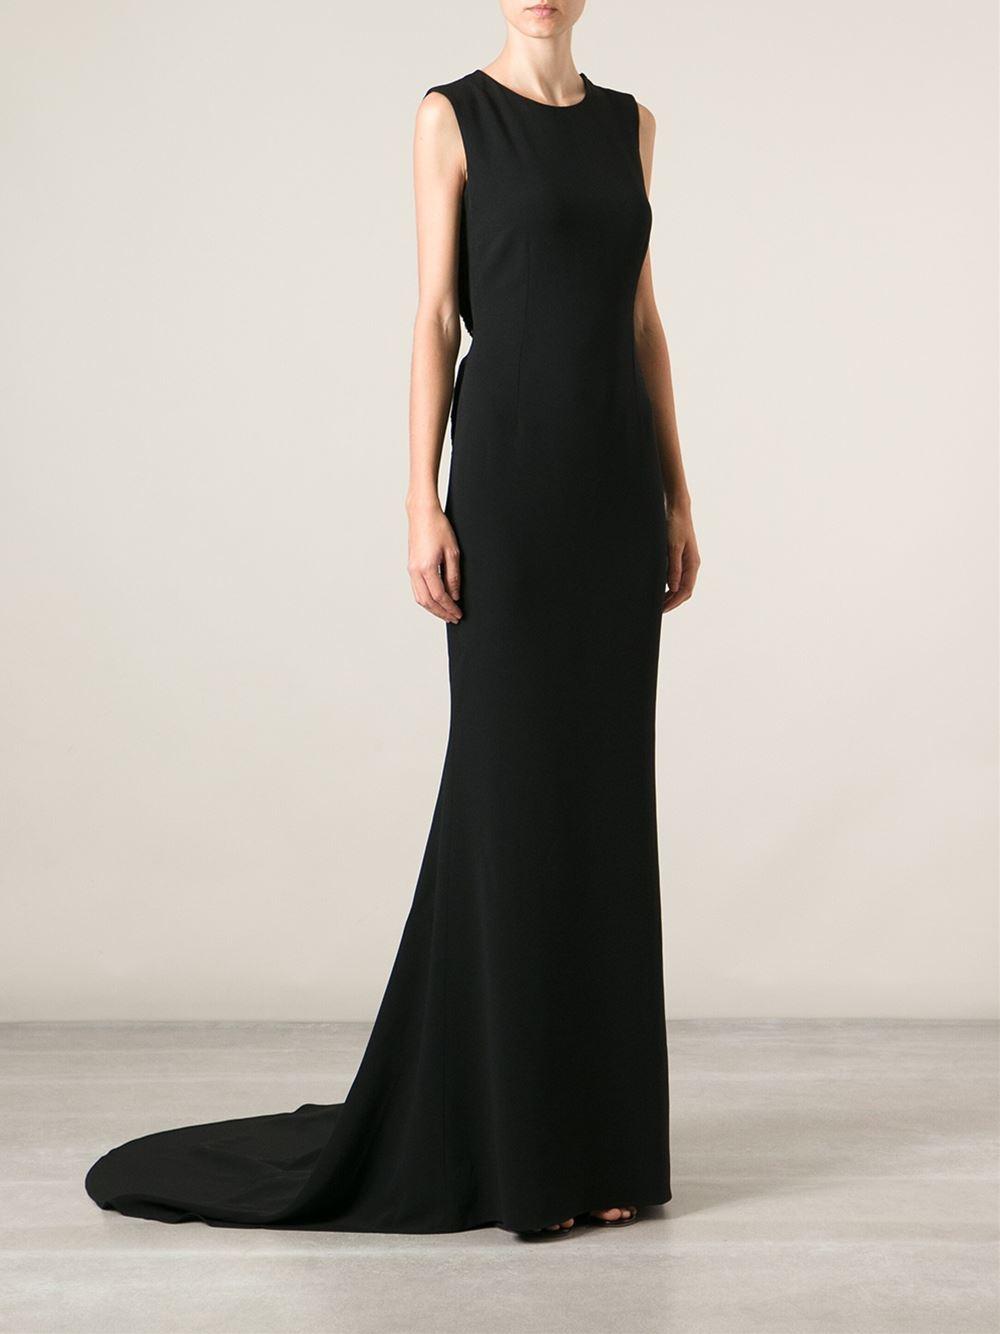 Stella Mccartney Evening Gown in Black - Lyst